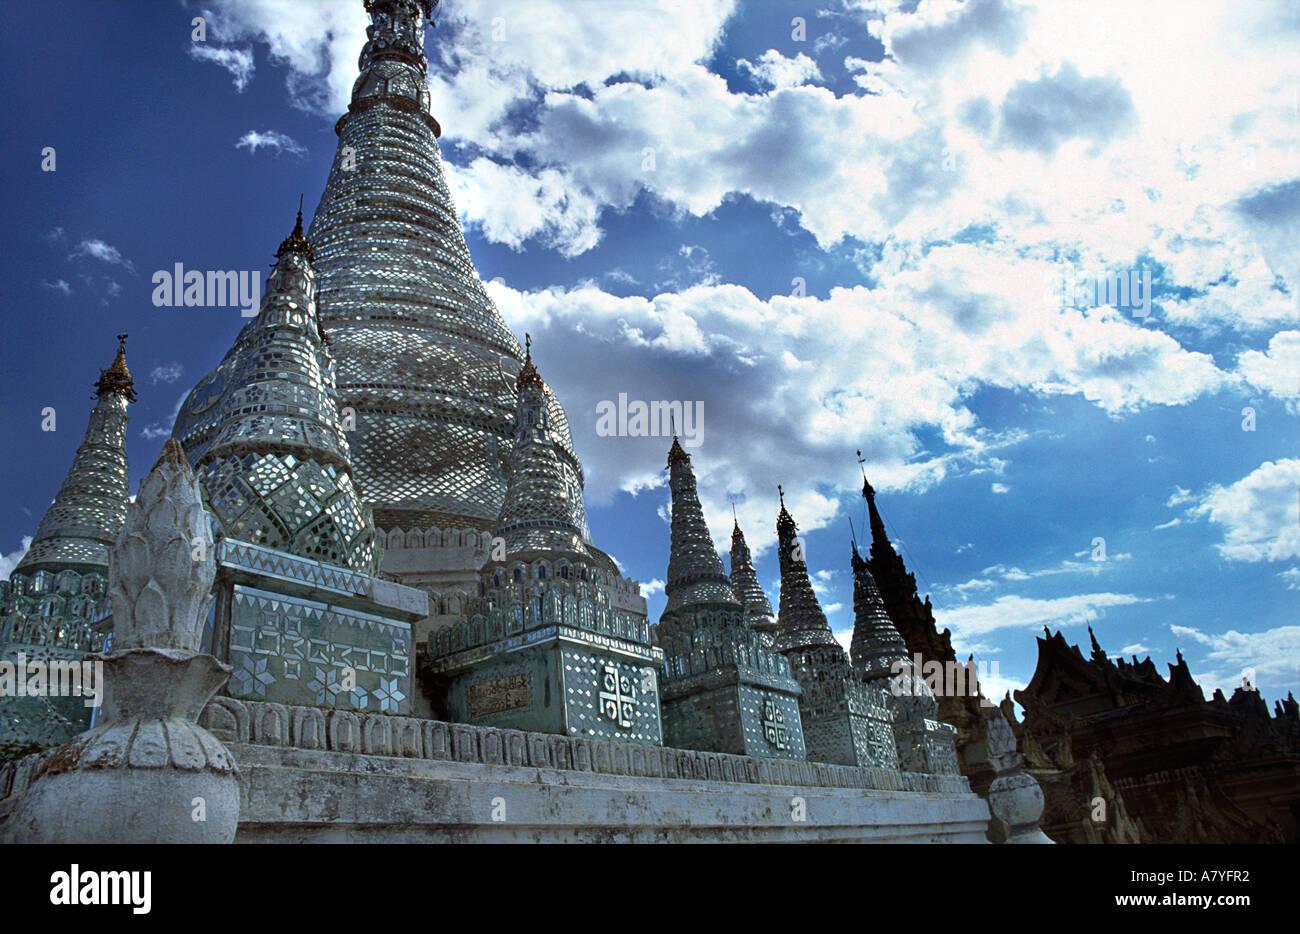 Mirrored stupas at Maha Aungmye Bonzan monastery Ava near Mandalay Burma MYANMAR - Stock Image